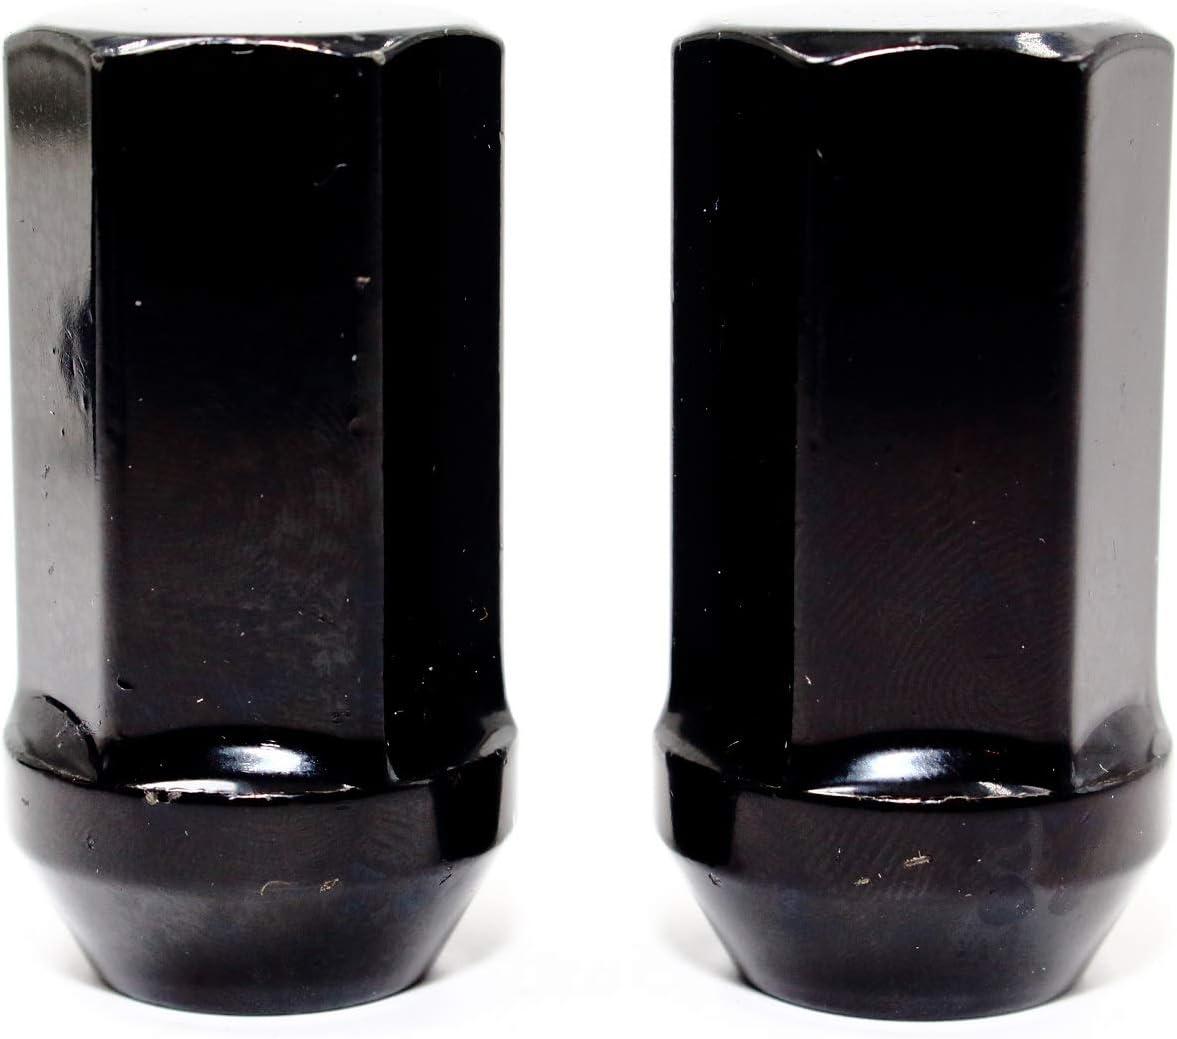 Set of 24 Veritek 14x1.5mm 1.75 Inch 45mm Overall Length 7//8 22mm Hex Black Acorn Lug Nuts for Aftermarket Custom SUV Truck Wheels